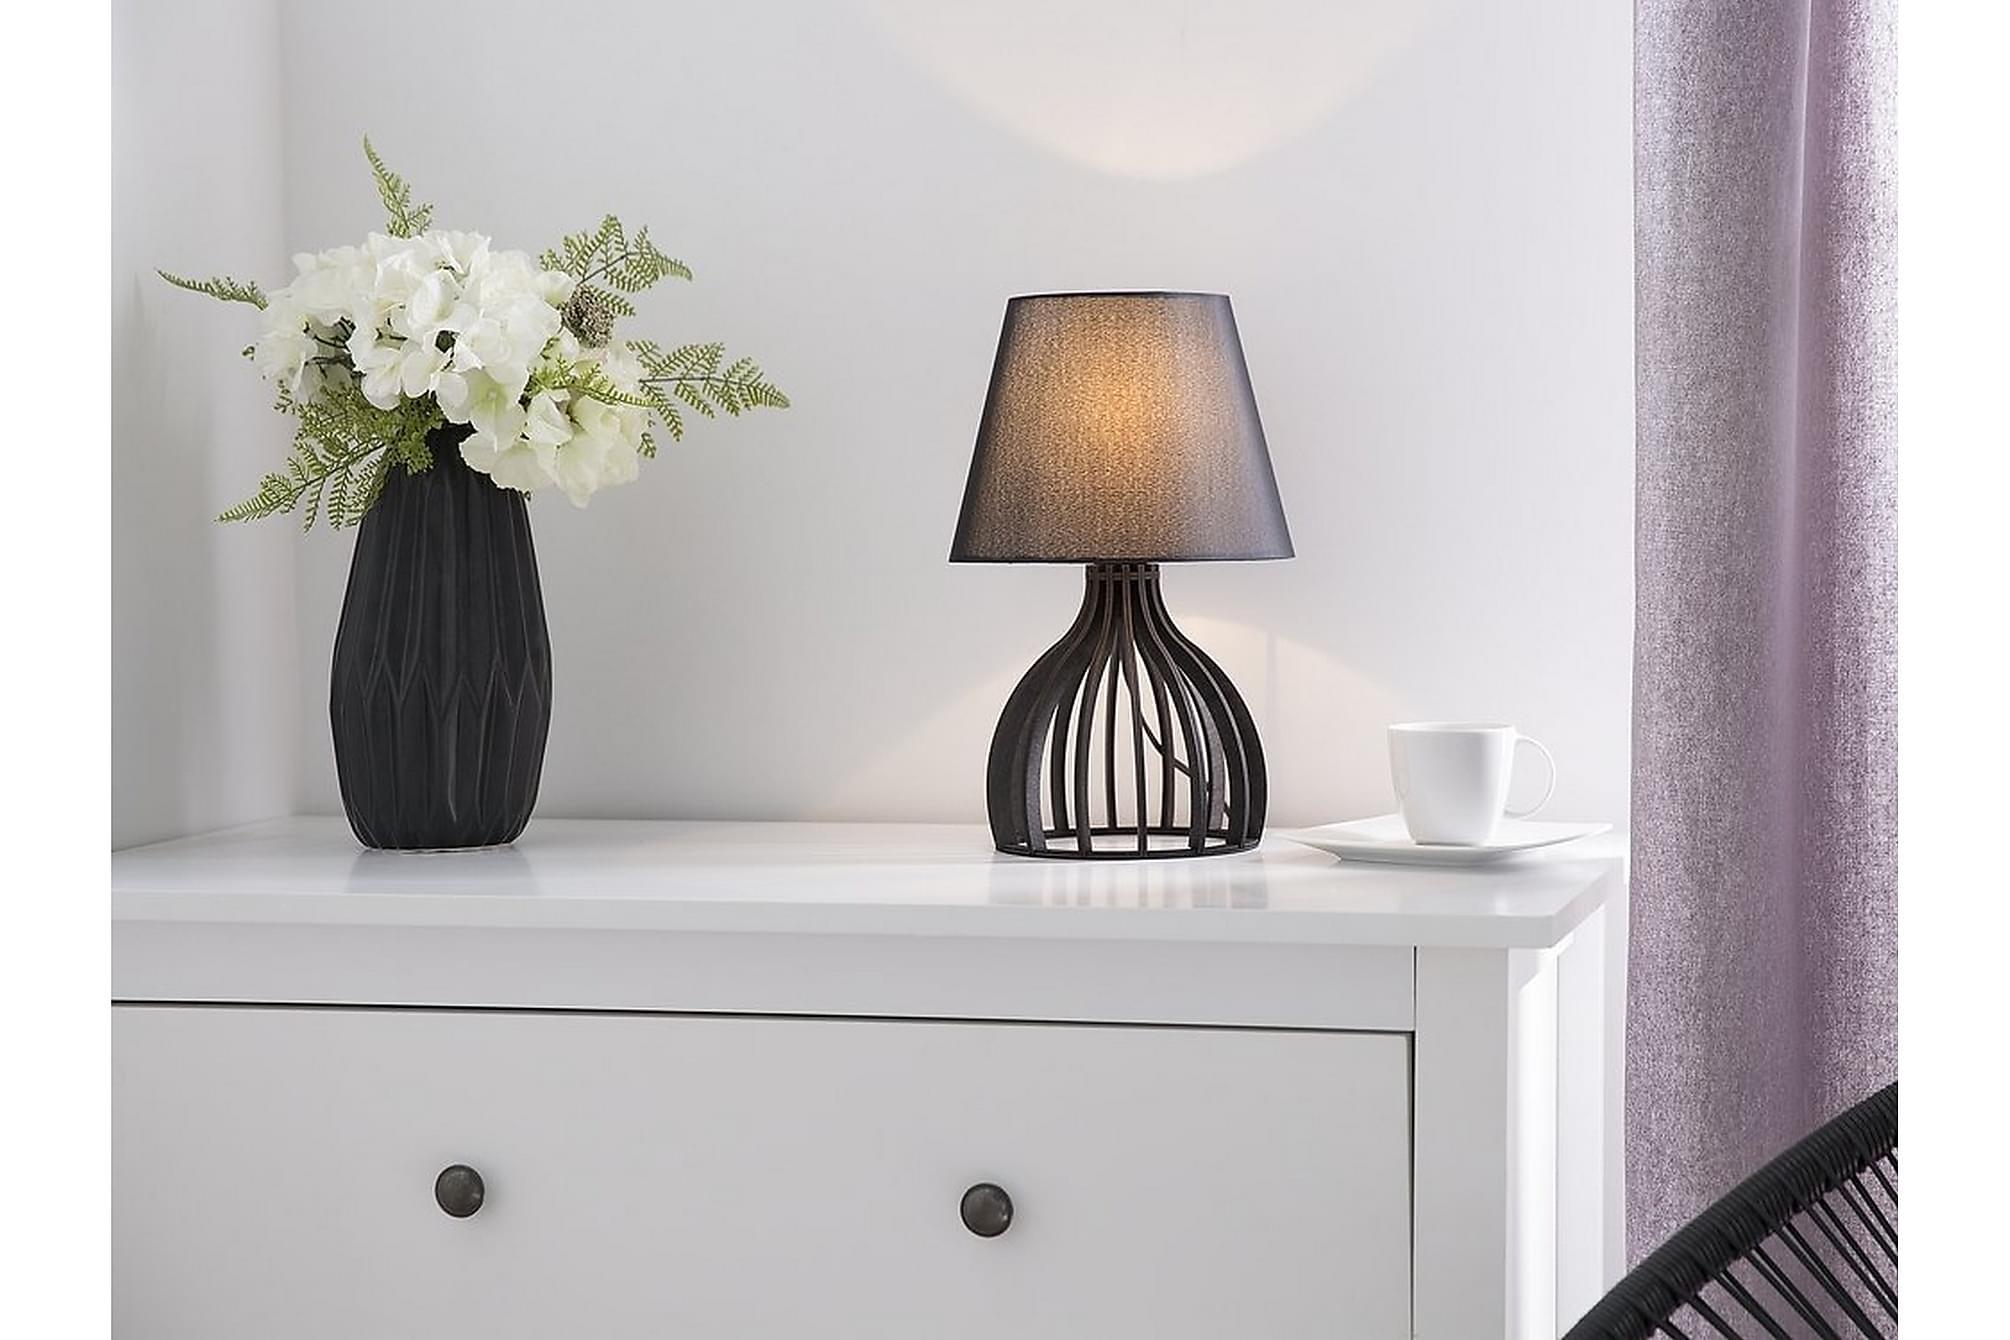 AGUEDA Bordslampa 22 cm, Bordslampor